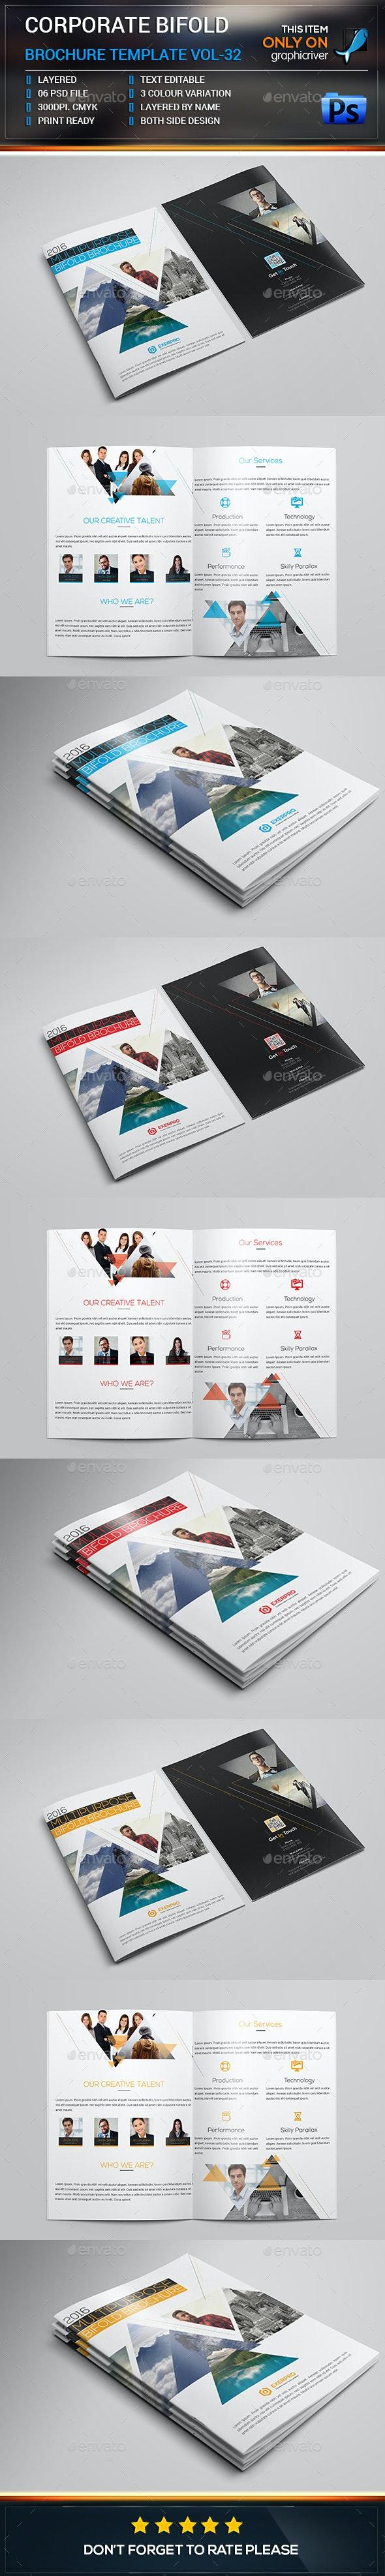 Corporate Bifold Brochure Template vol-32 - Corporate Brochures